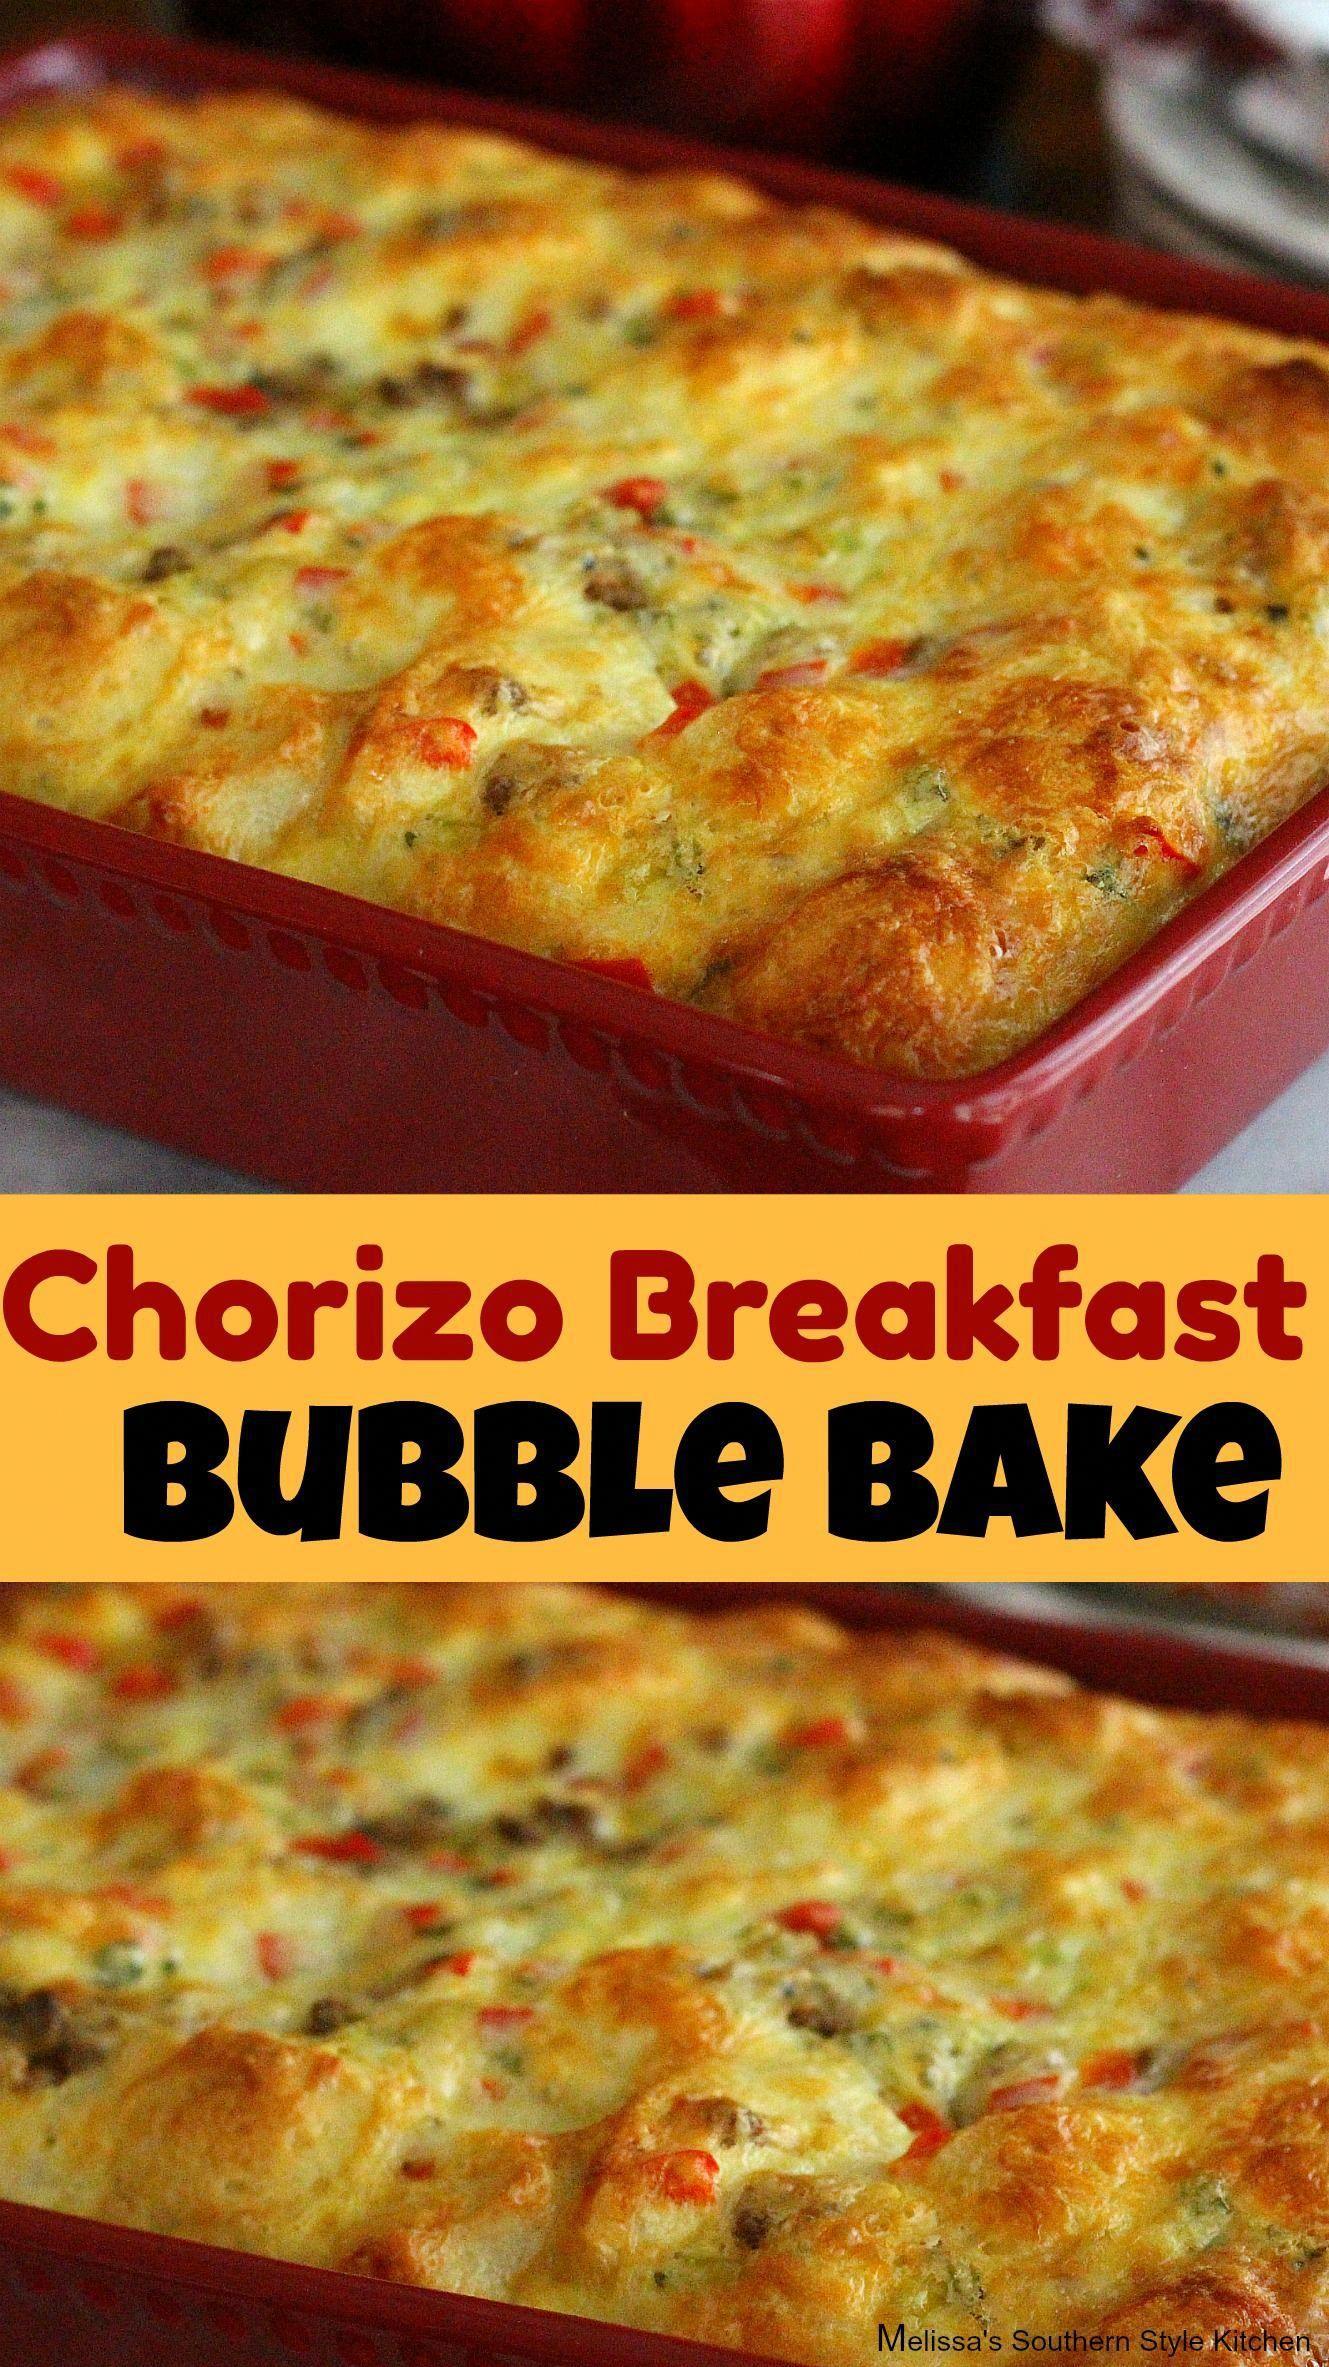 Chorizo Breakfast Bubble Bake #brunch #breakfast #makeahead #chorizo #holidaybrunchrecipes #christmas #easter #casseroles #recipes #food #cheesy #newyearseve #breakfastappetizer